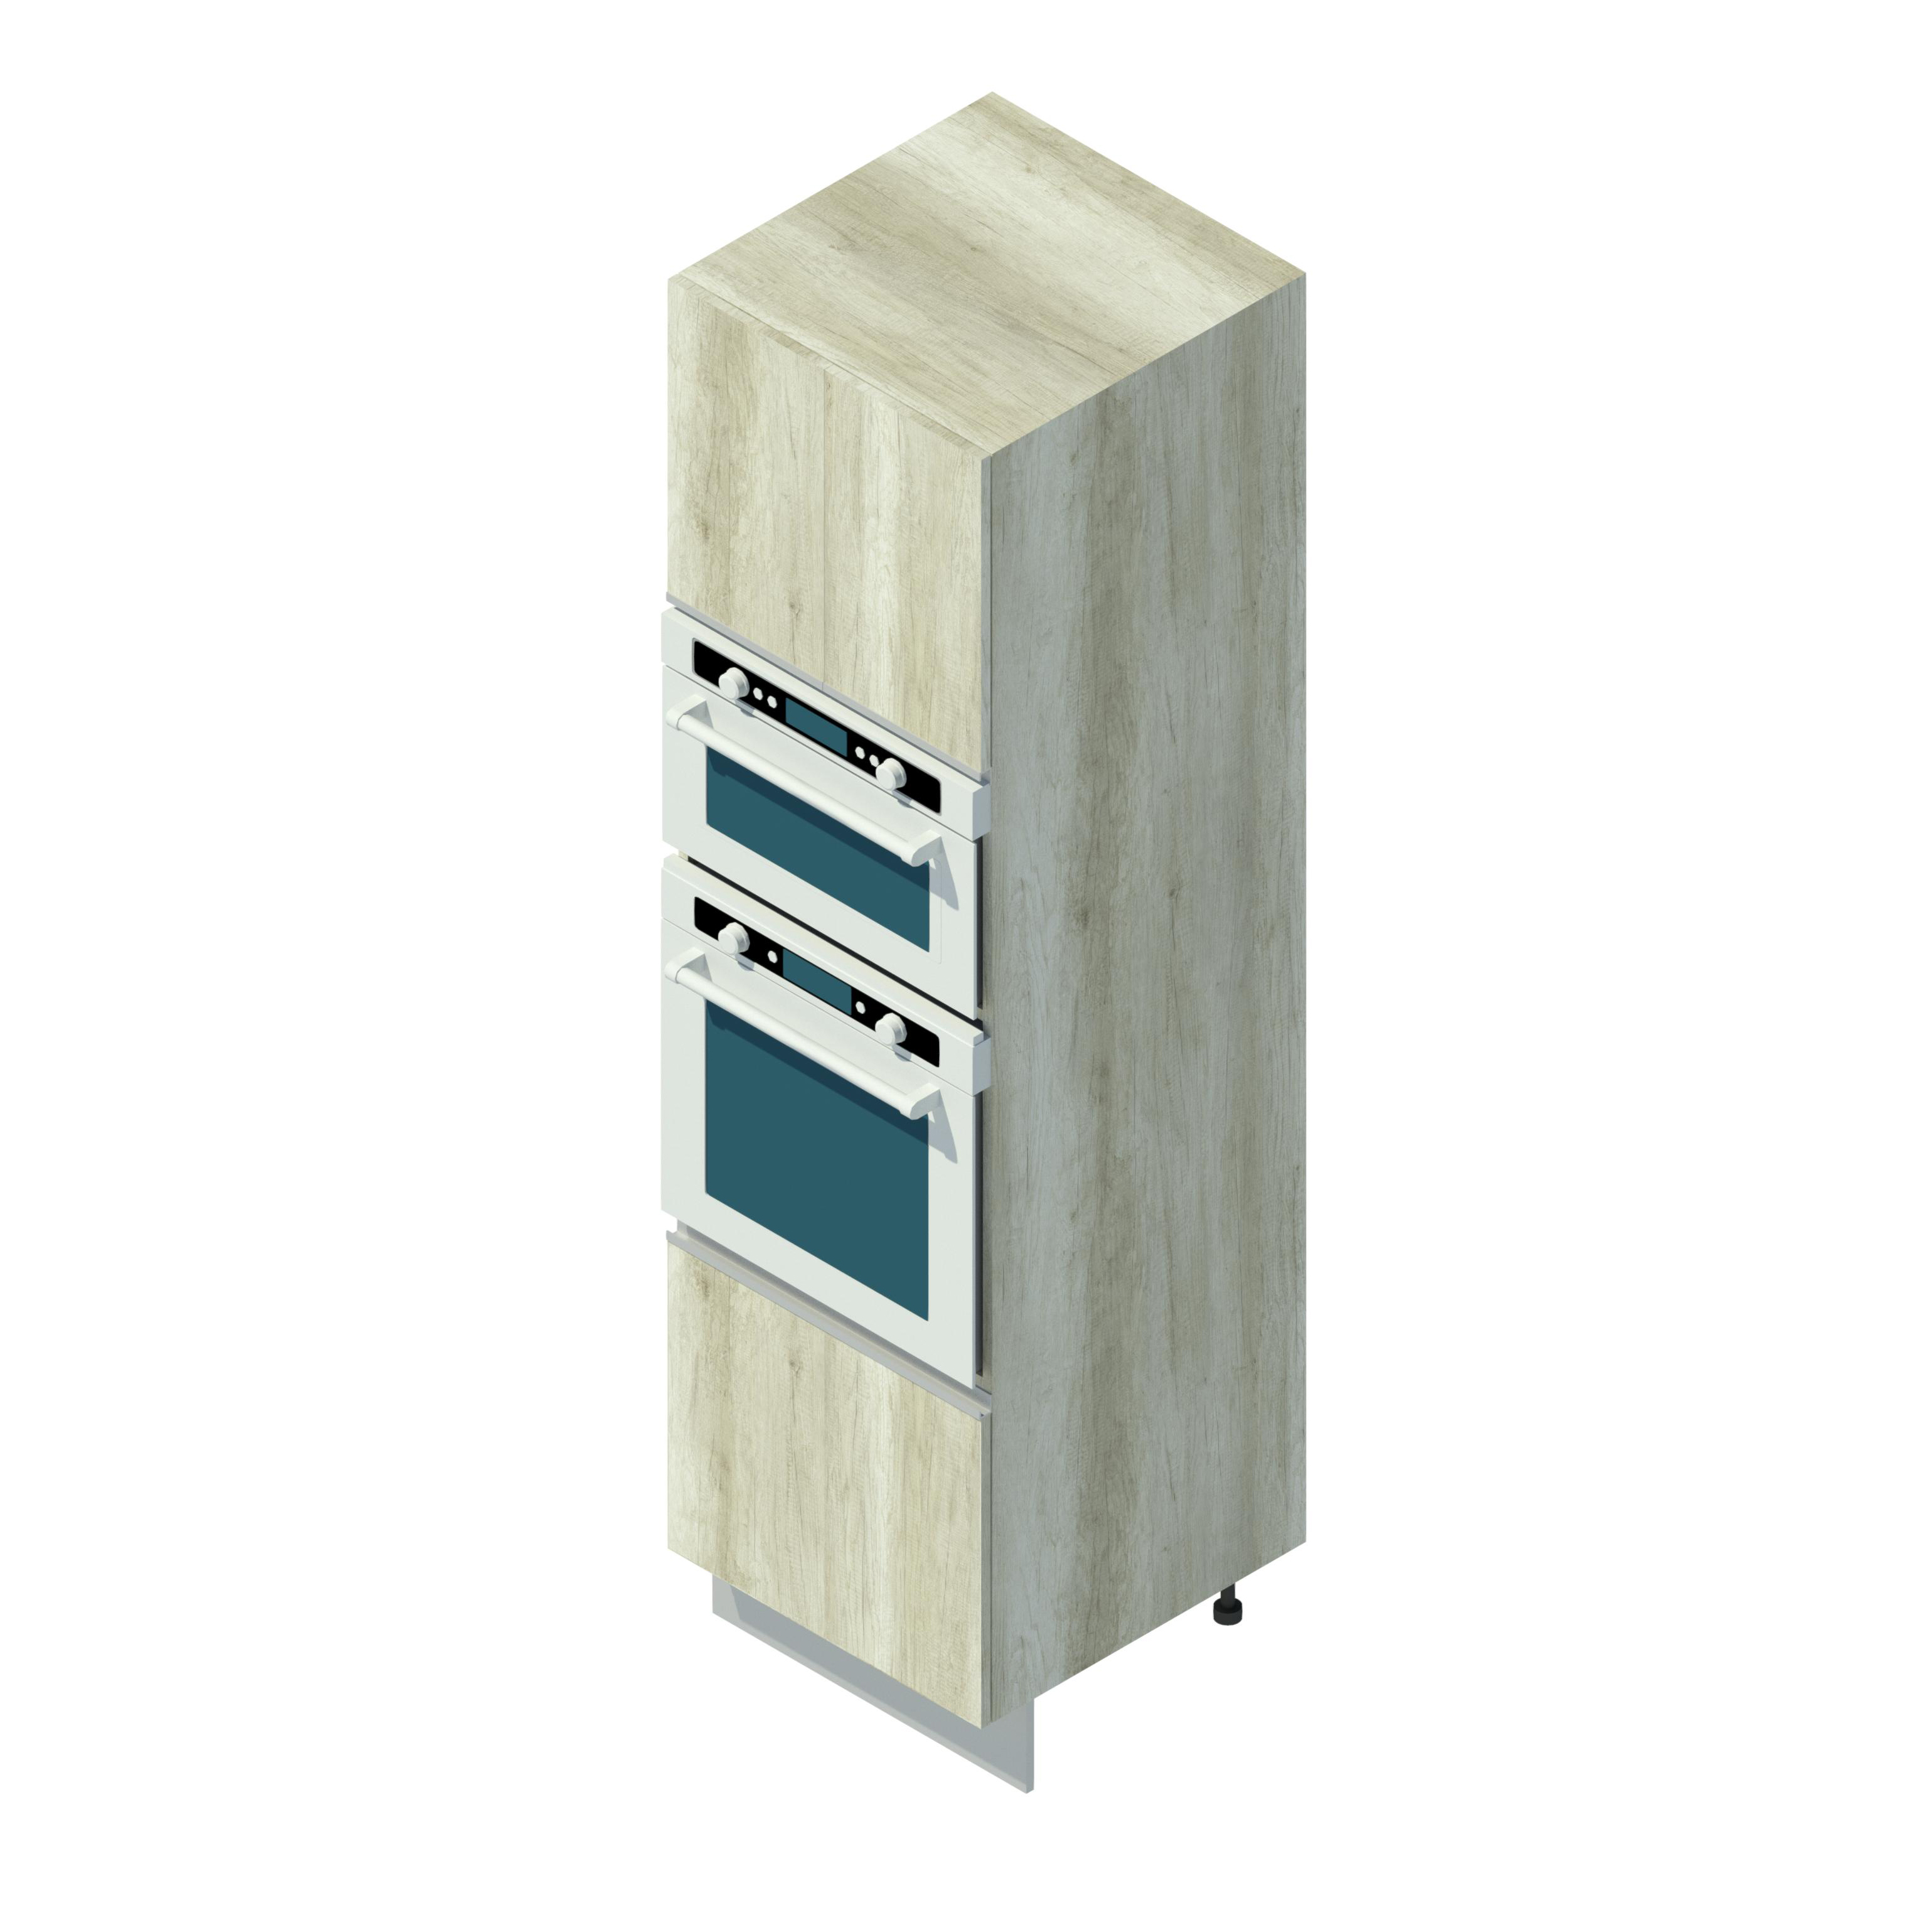 Muebles Arauco: Torre Horno